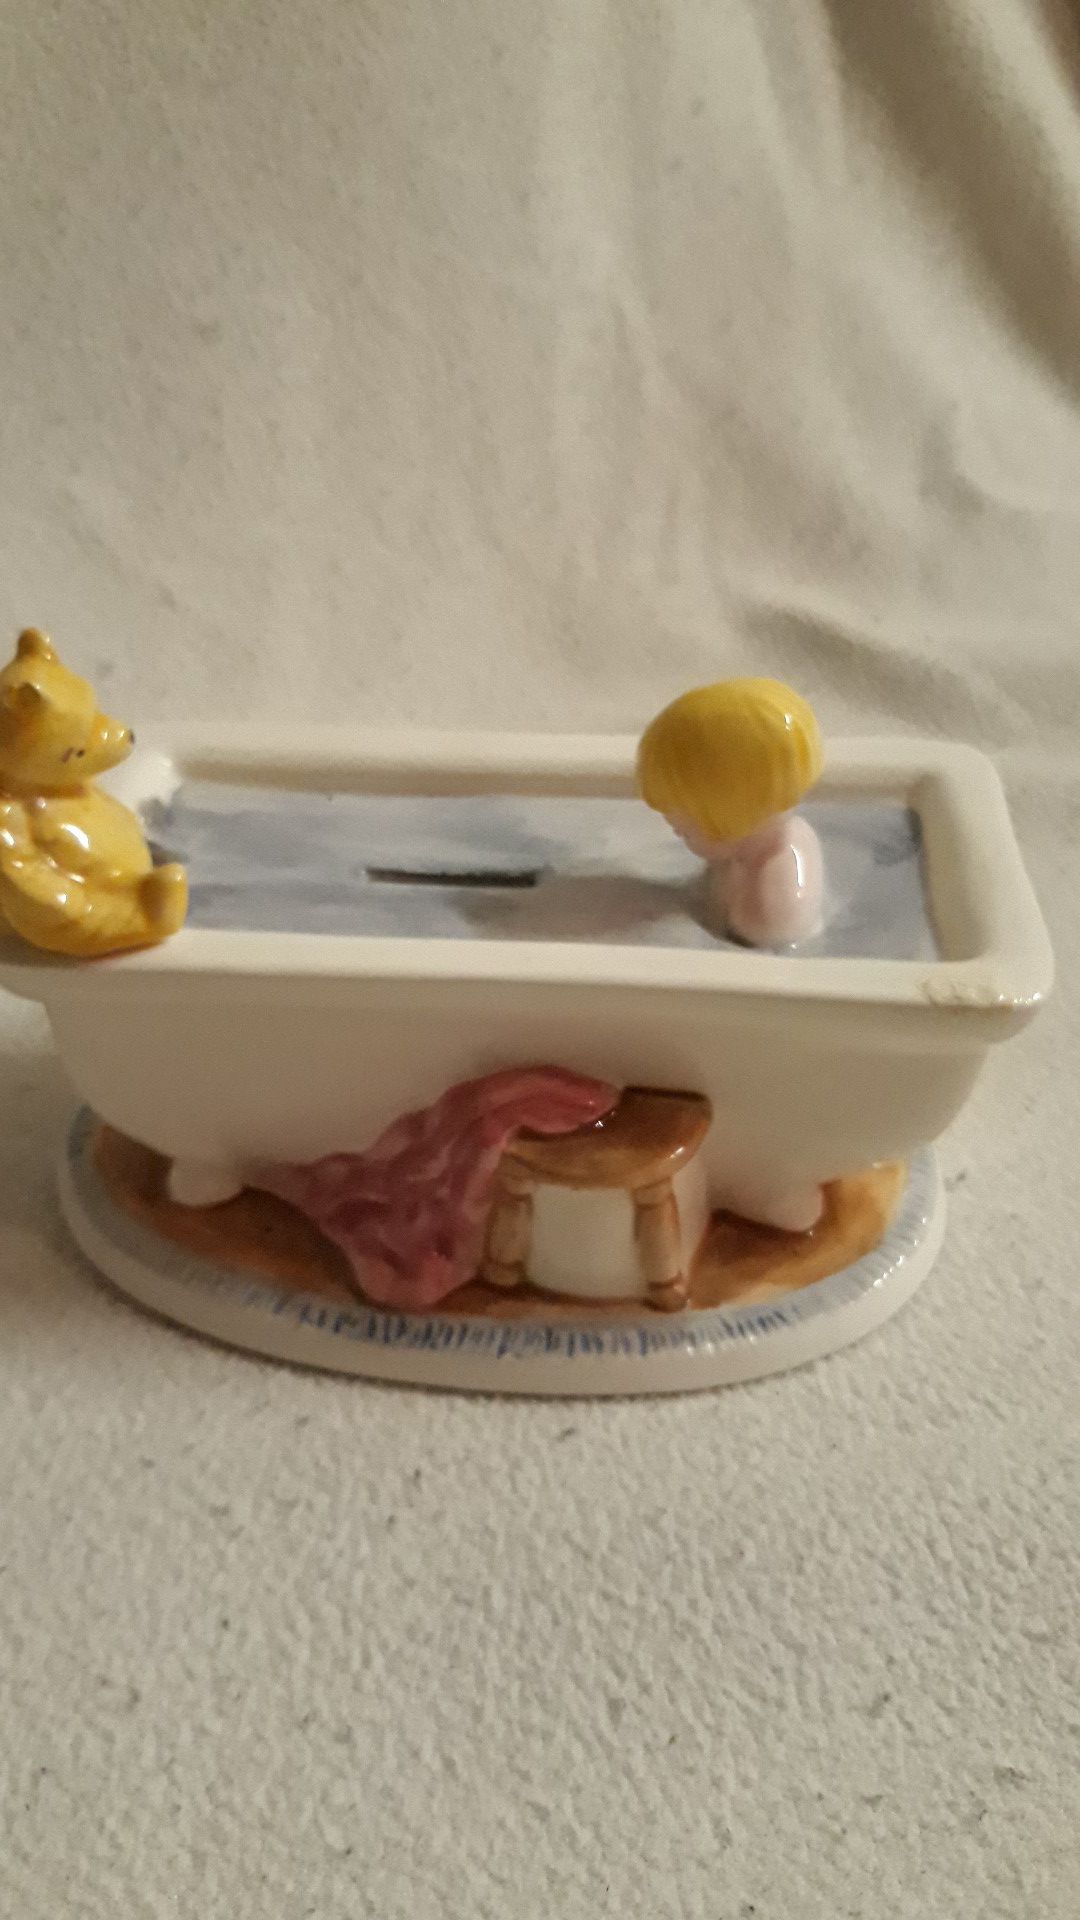 Winnie-the-Pooh Bank. No chips or cracks. No plug on bottom. $8